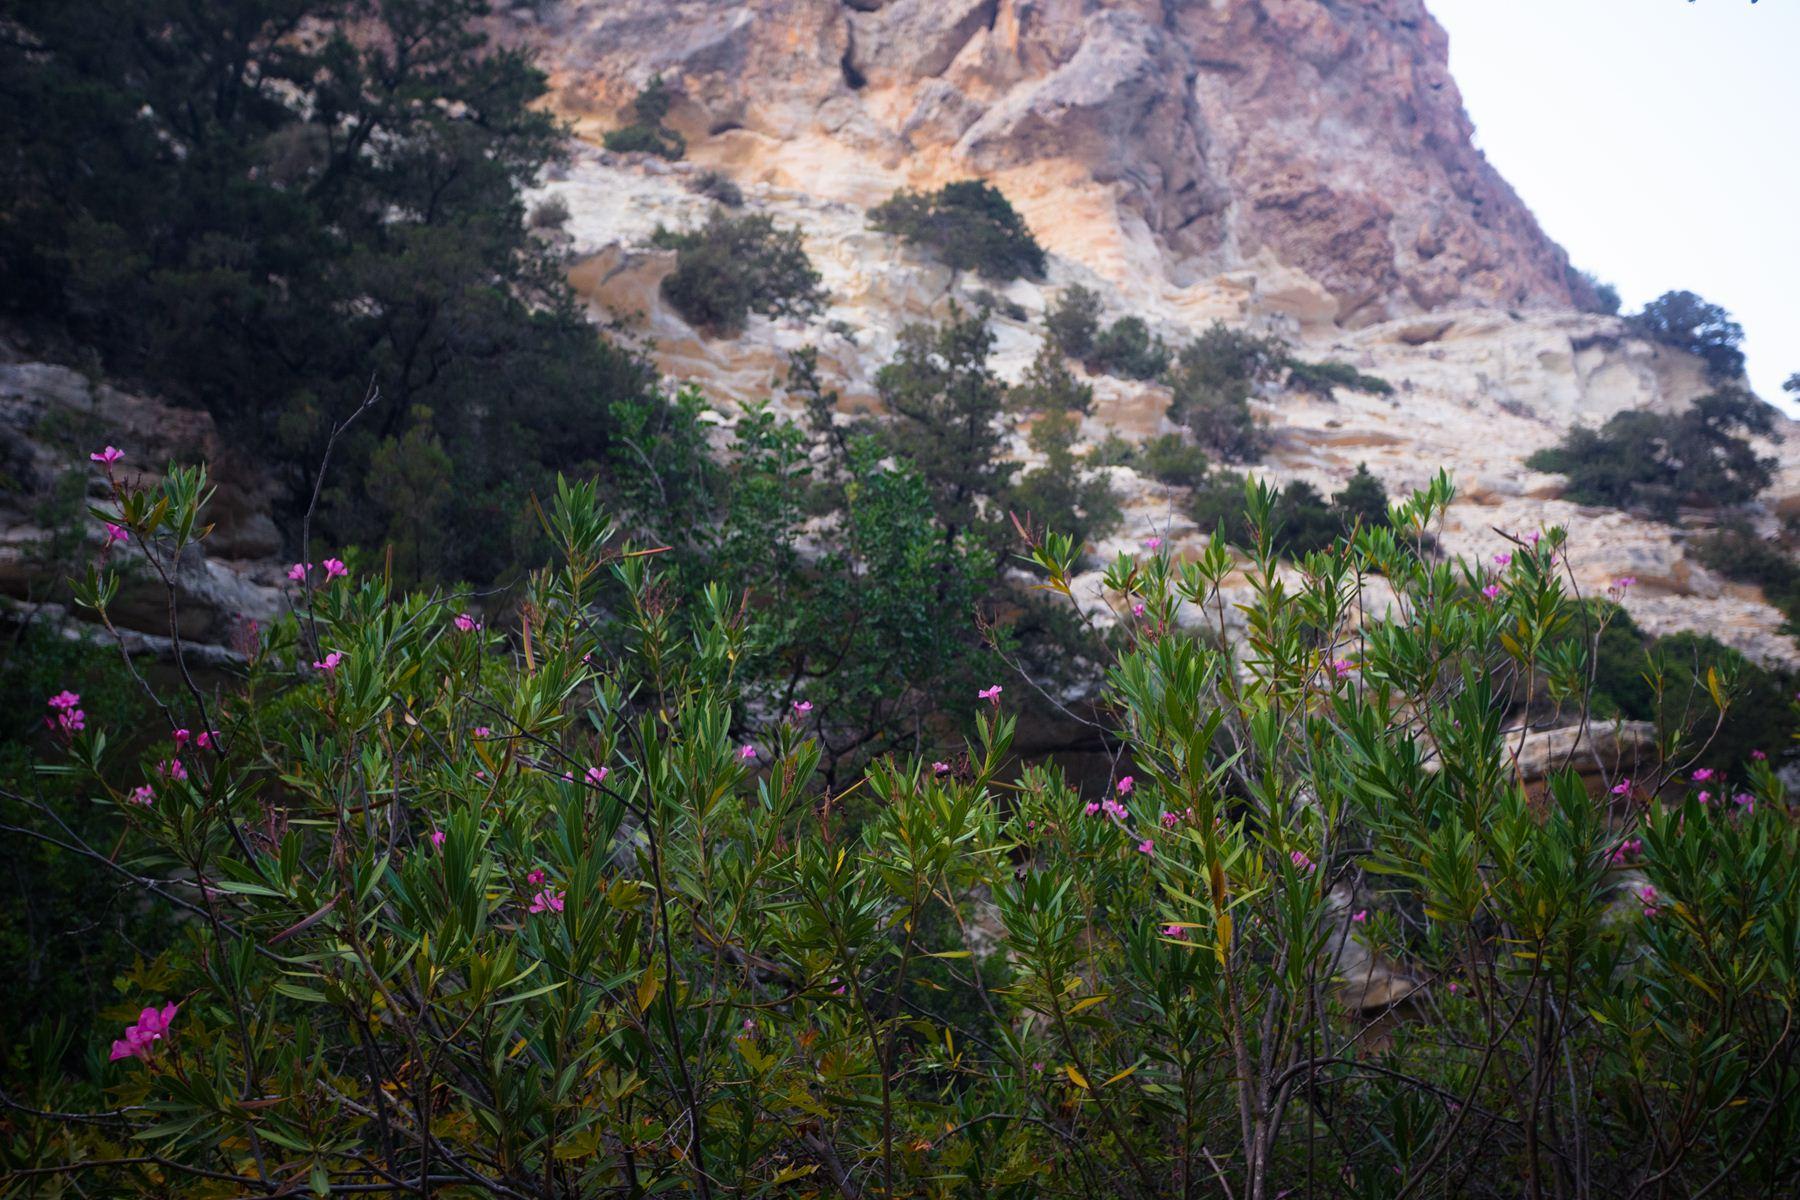 Эндемик Авакаса - розовая Centauria akamantis на фоне гор